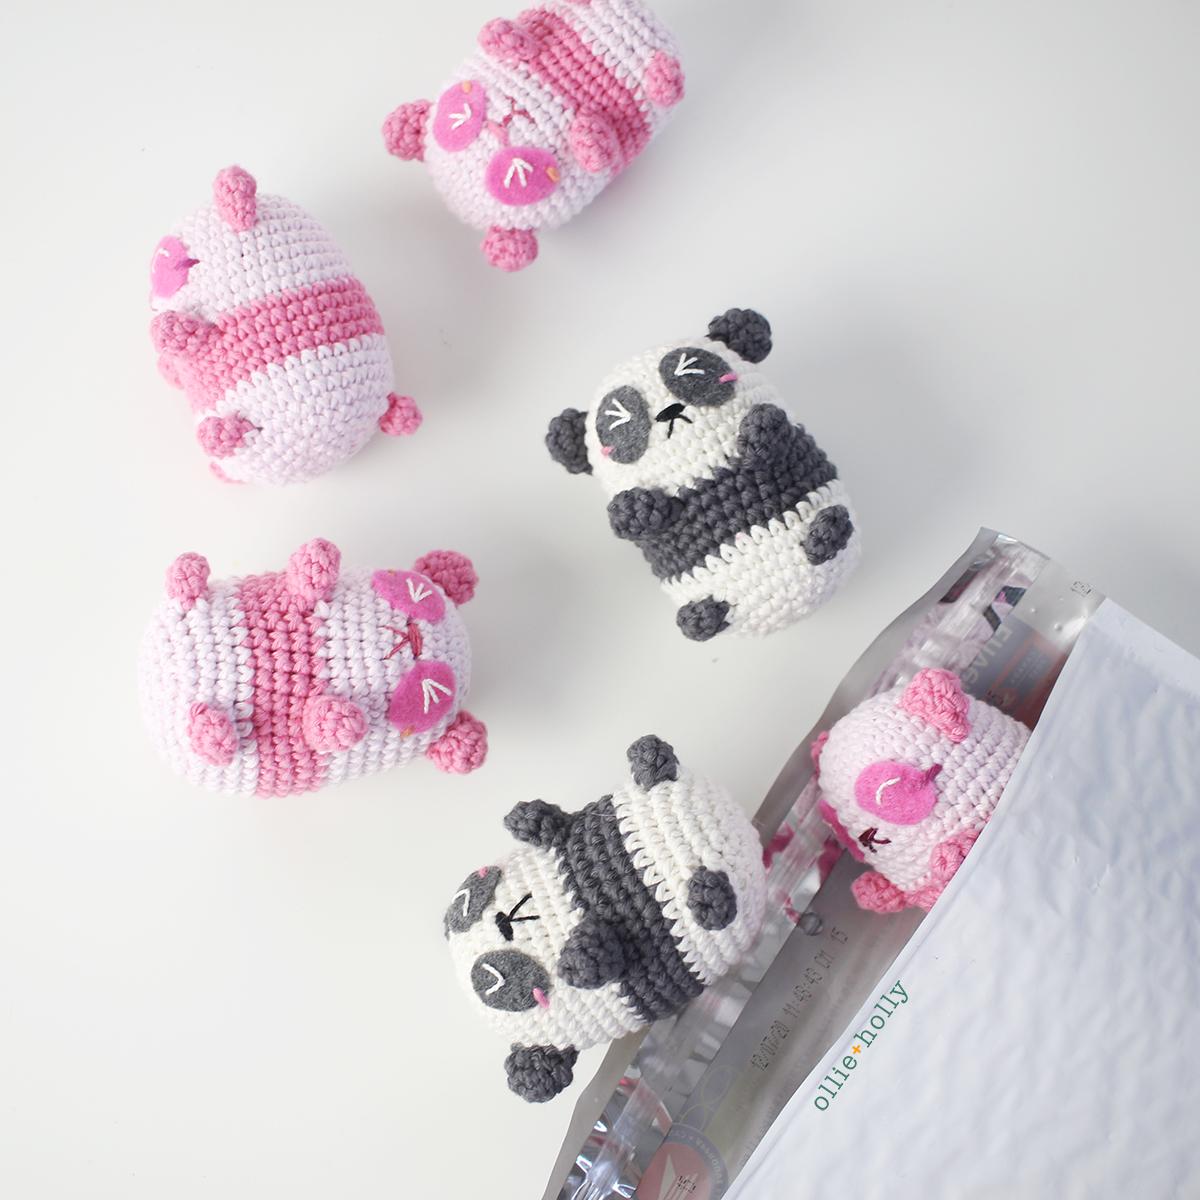 Free Onigiri The Stuffed Panda Bear Bean Amigurumi Crochet Pattern Multiple